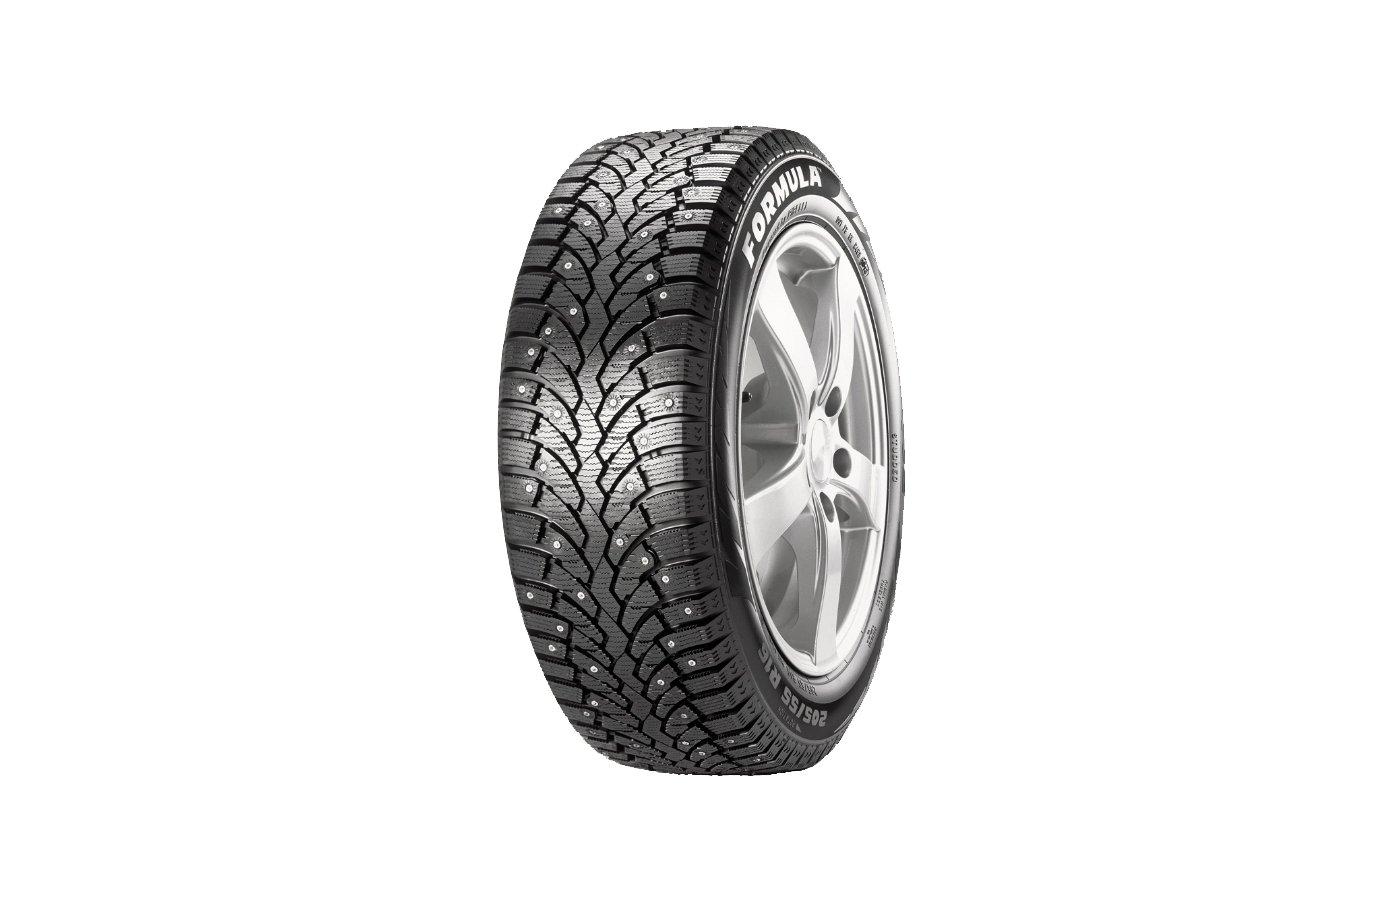 Шина Pirelli Formula Ice 185/65 R15 TL 88T шип